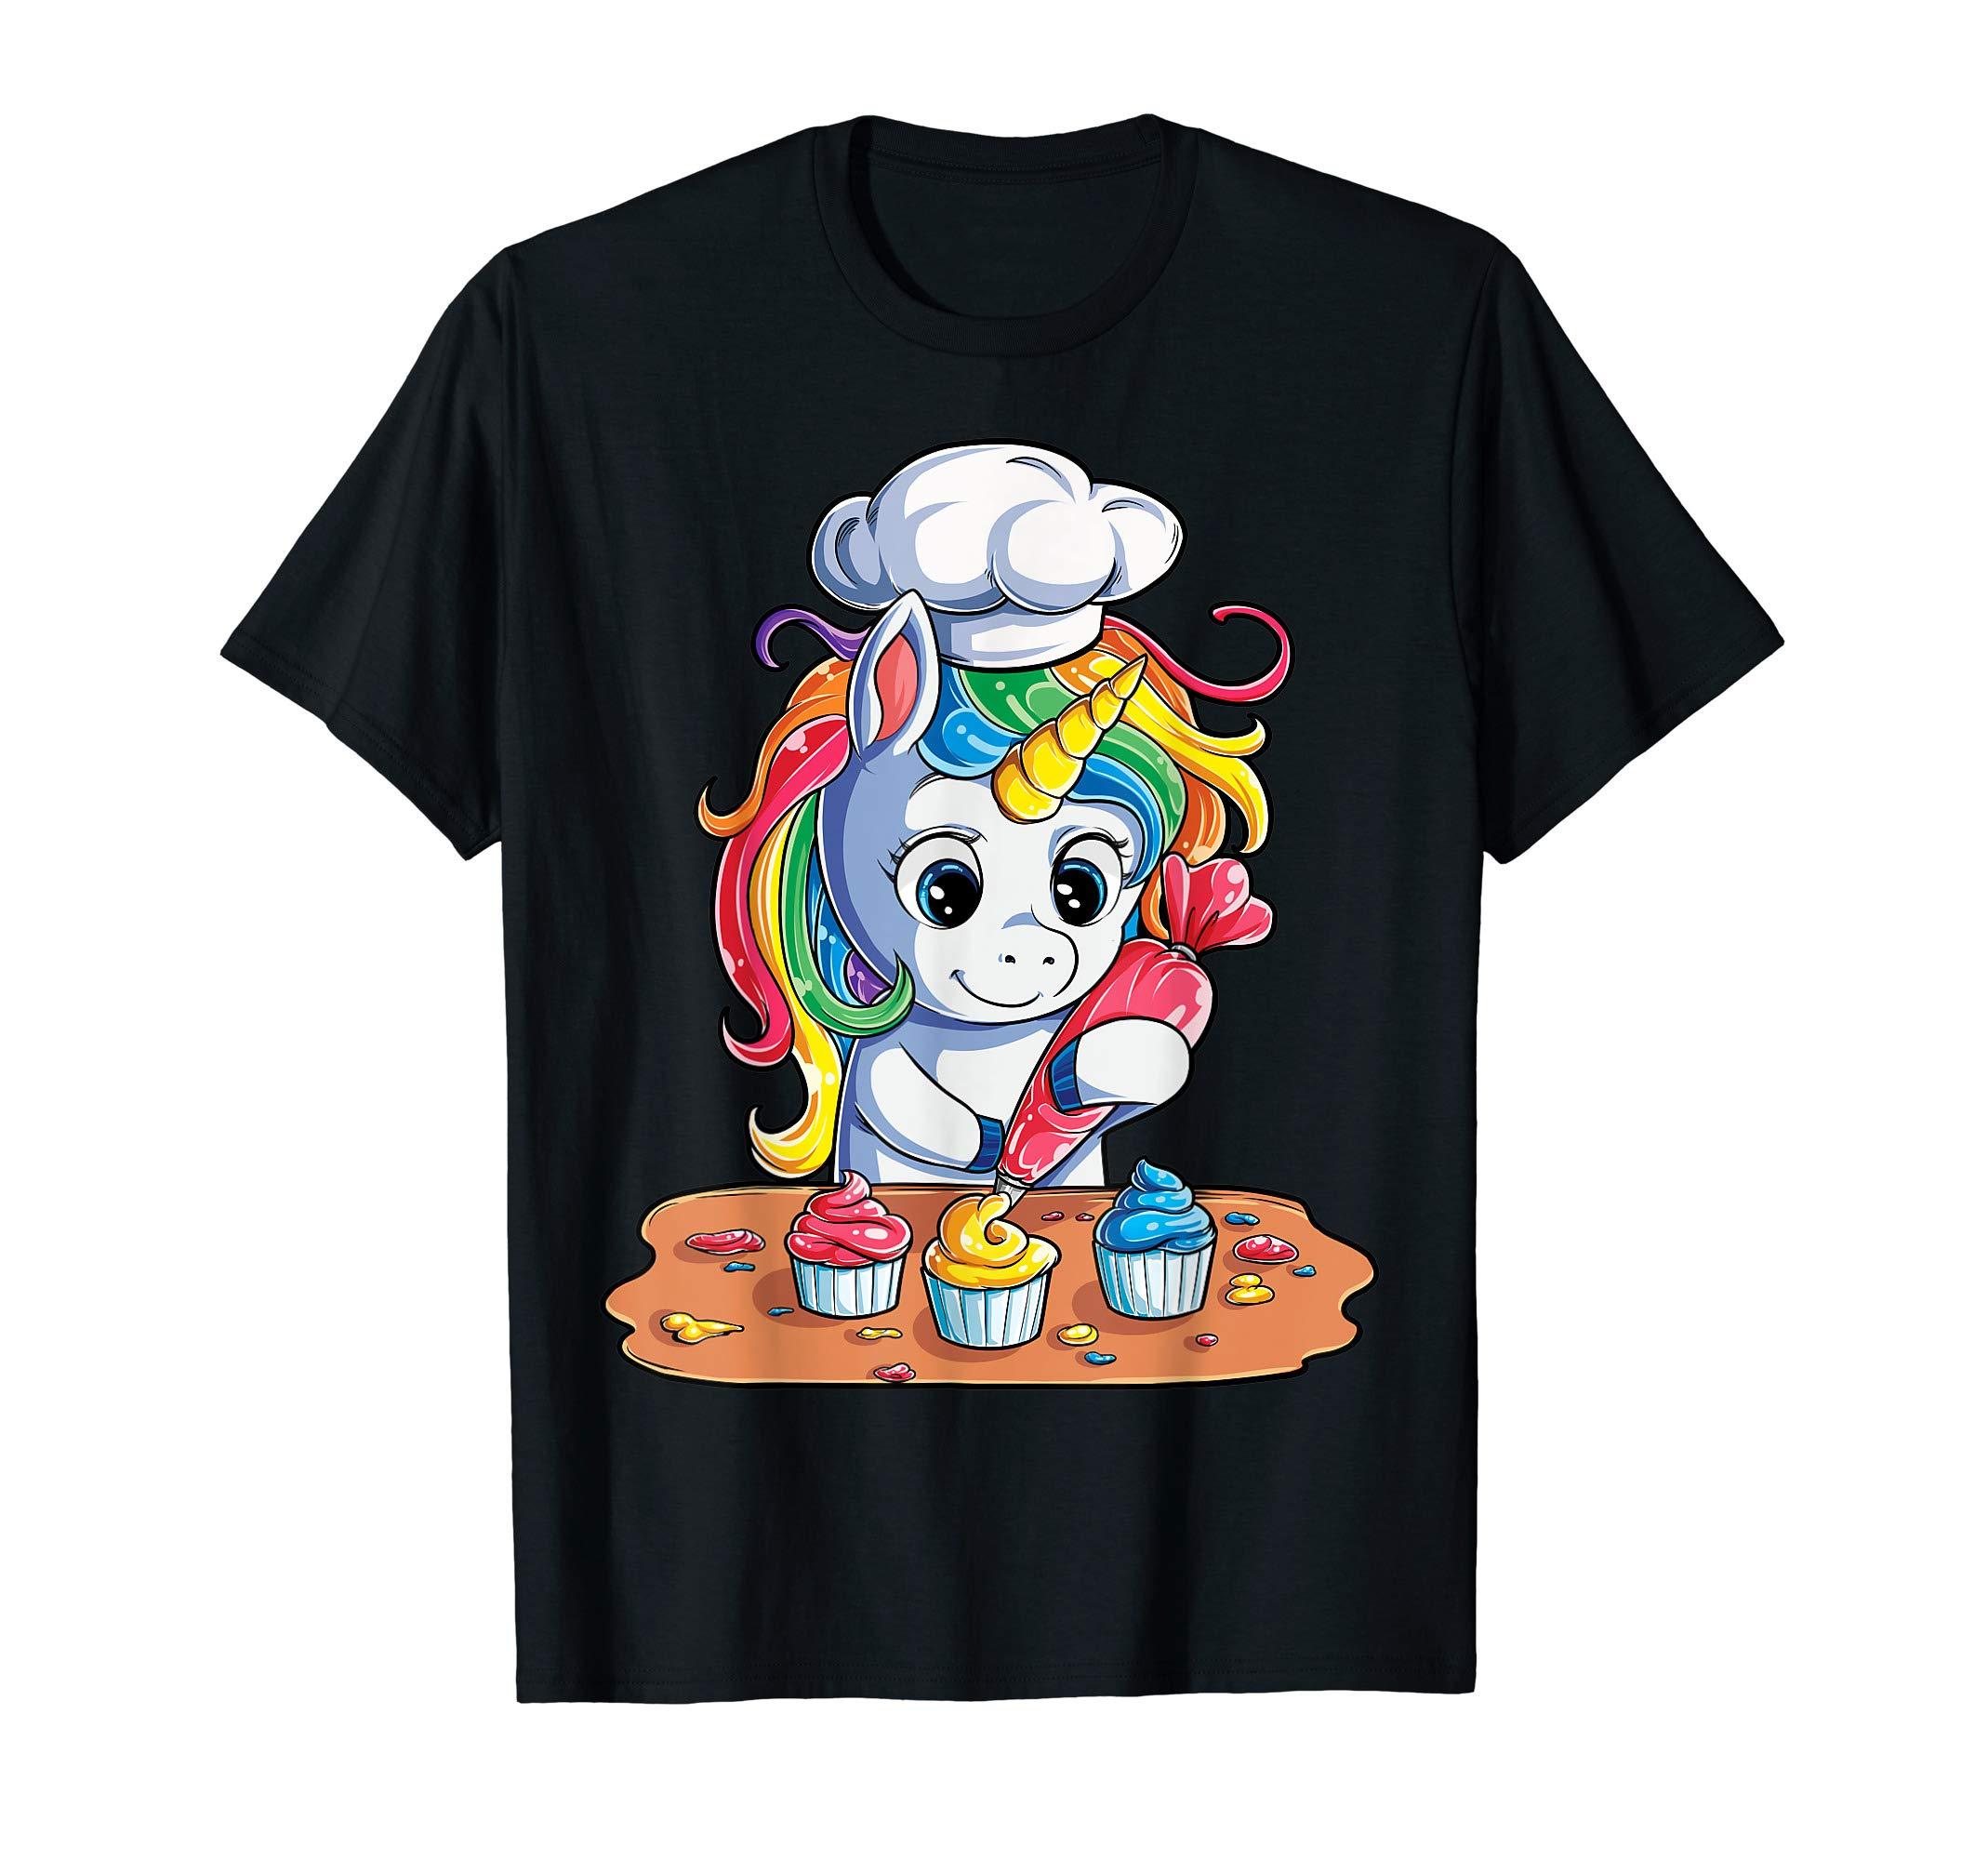 Unicorn Cupcake T shirt Girls Rainbow Unicorns Baking Cake by Lique Unicorn